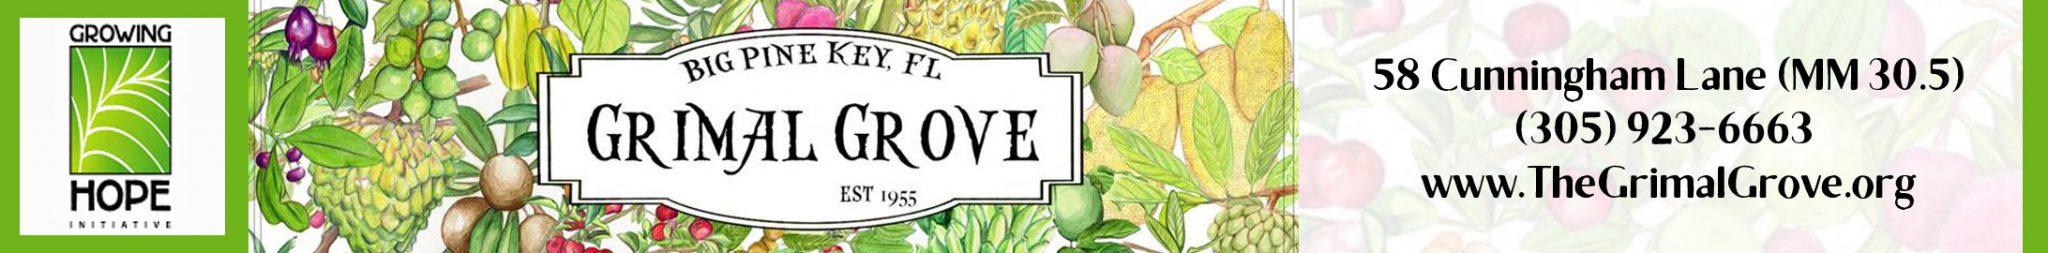 Grimal Grove